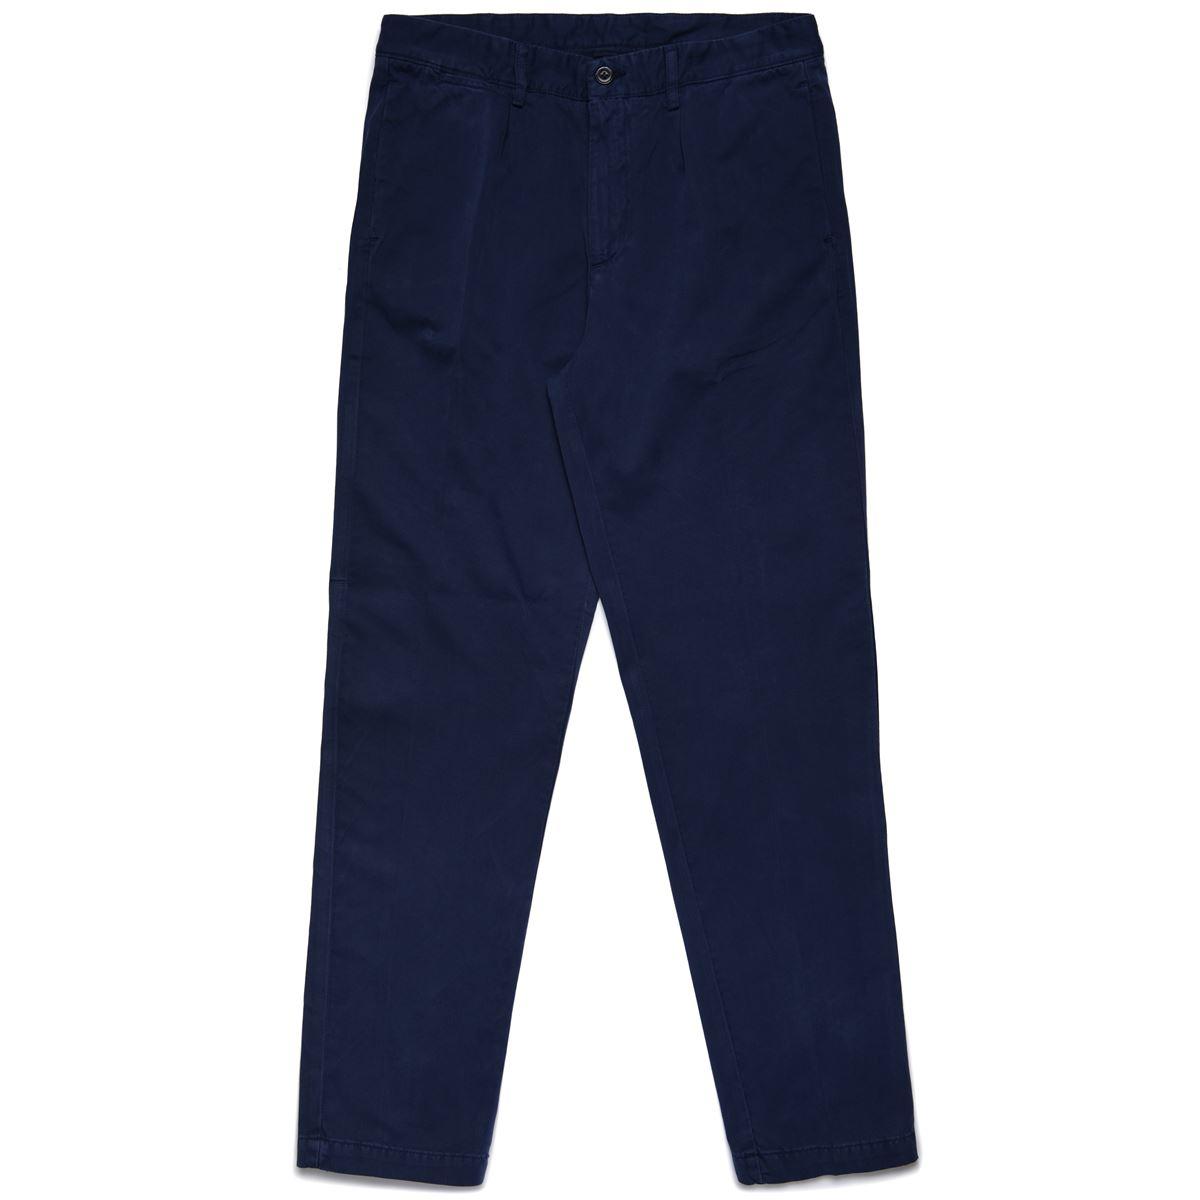 Robe di Kappa Pantaloni uomo-601N1M0